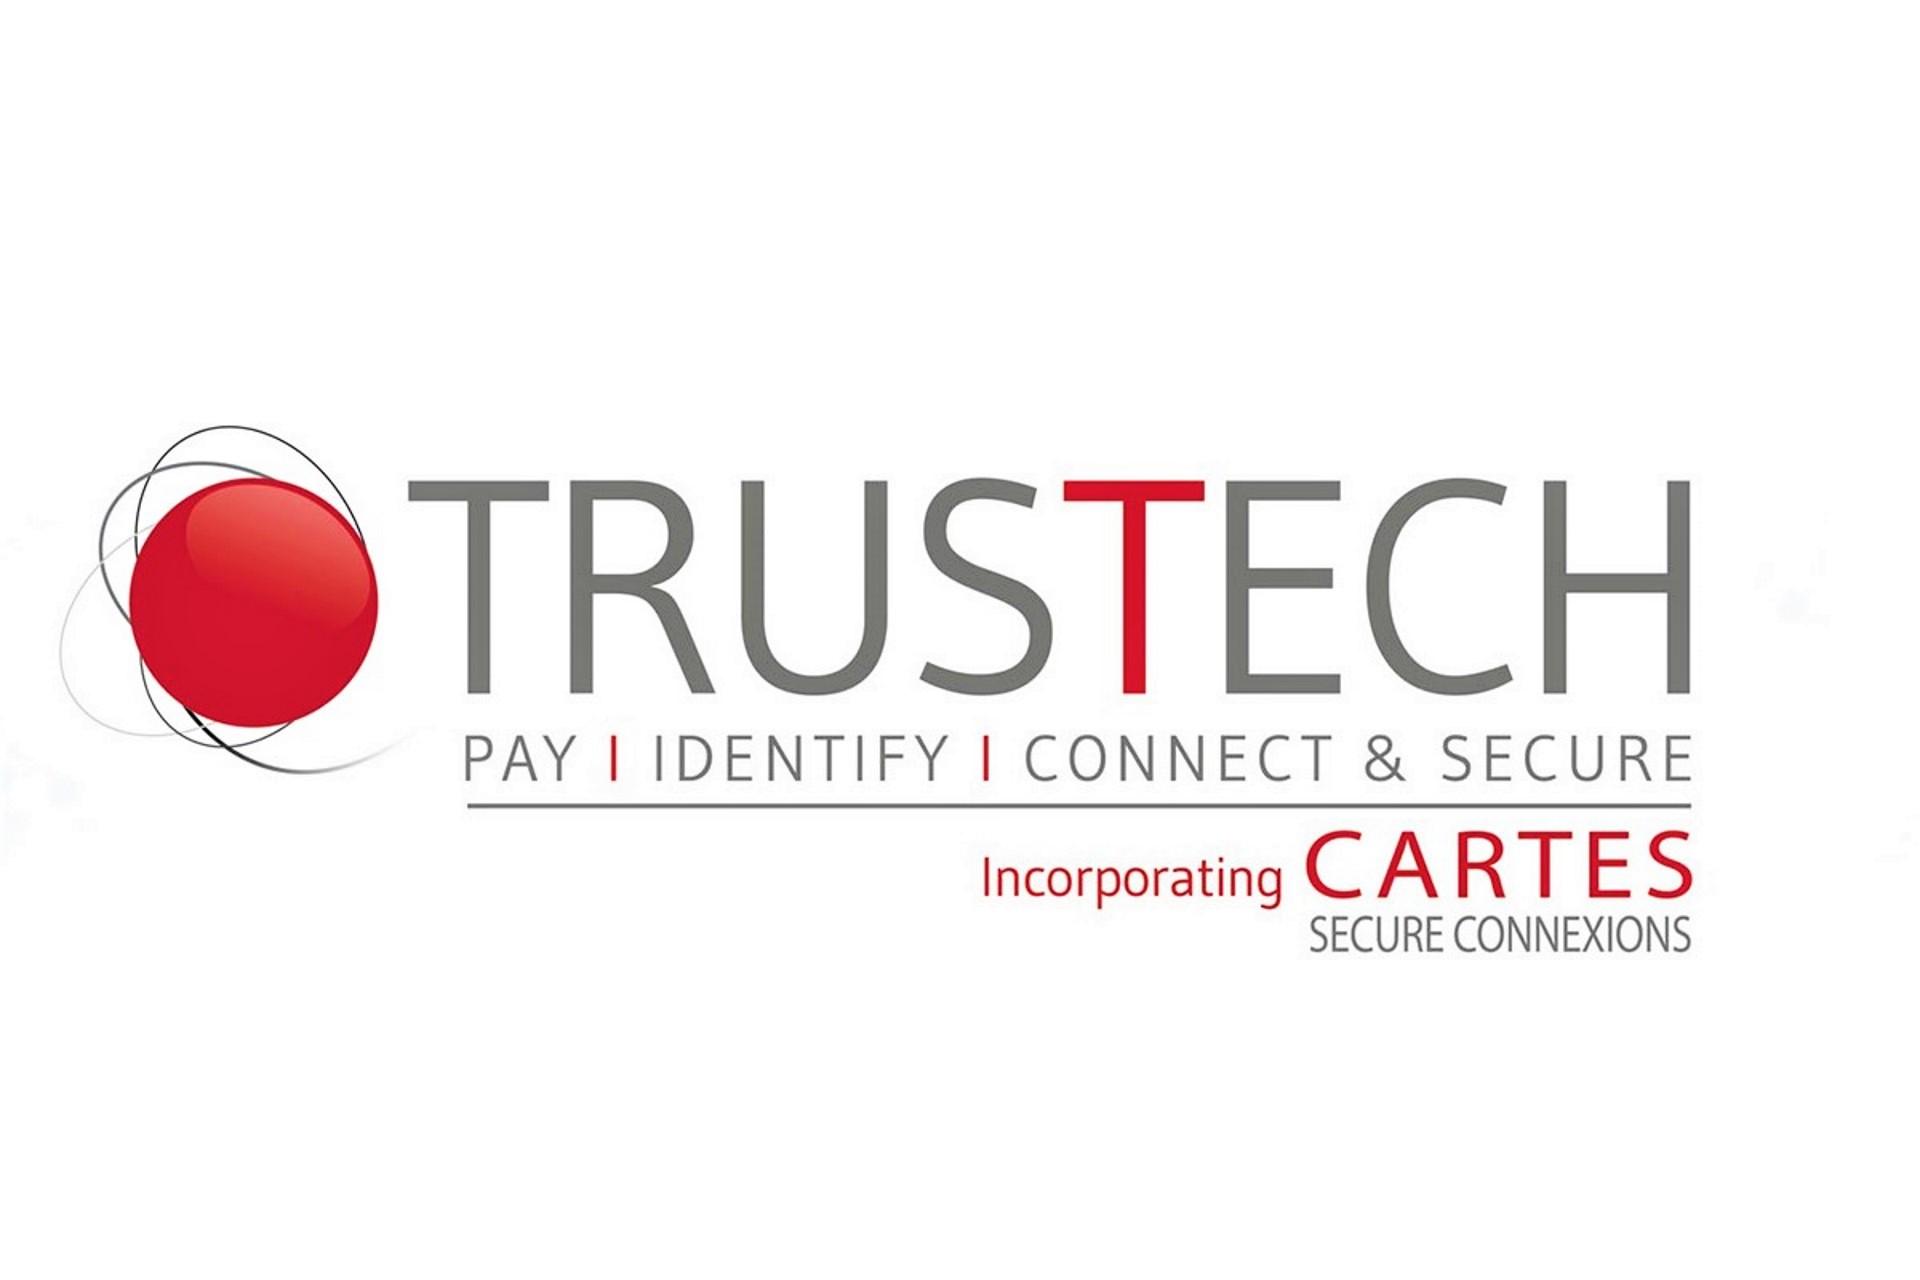 trustech cannes